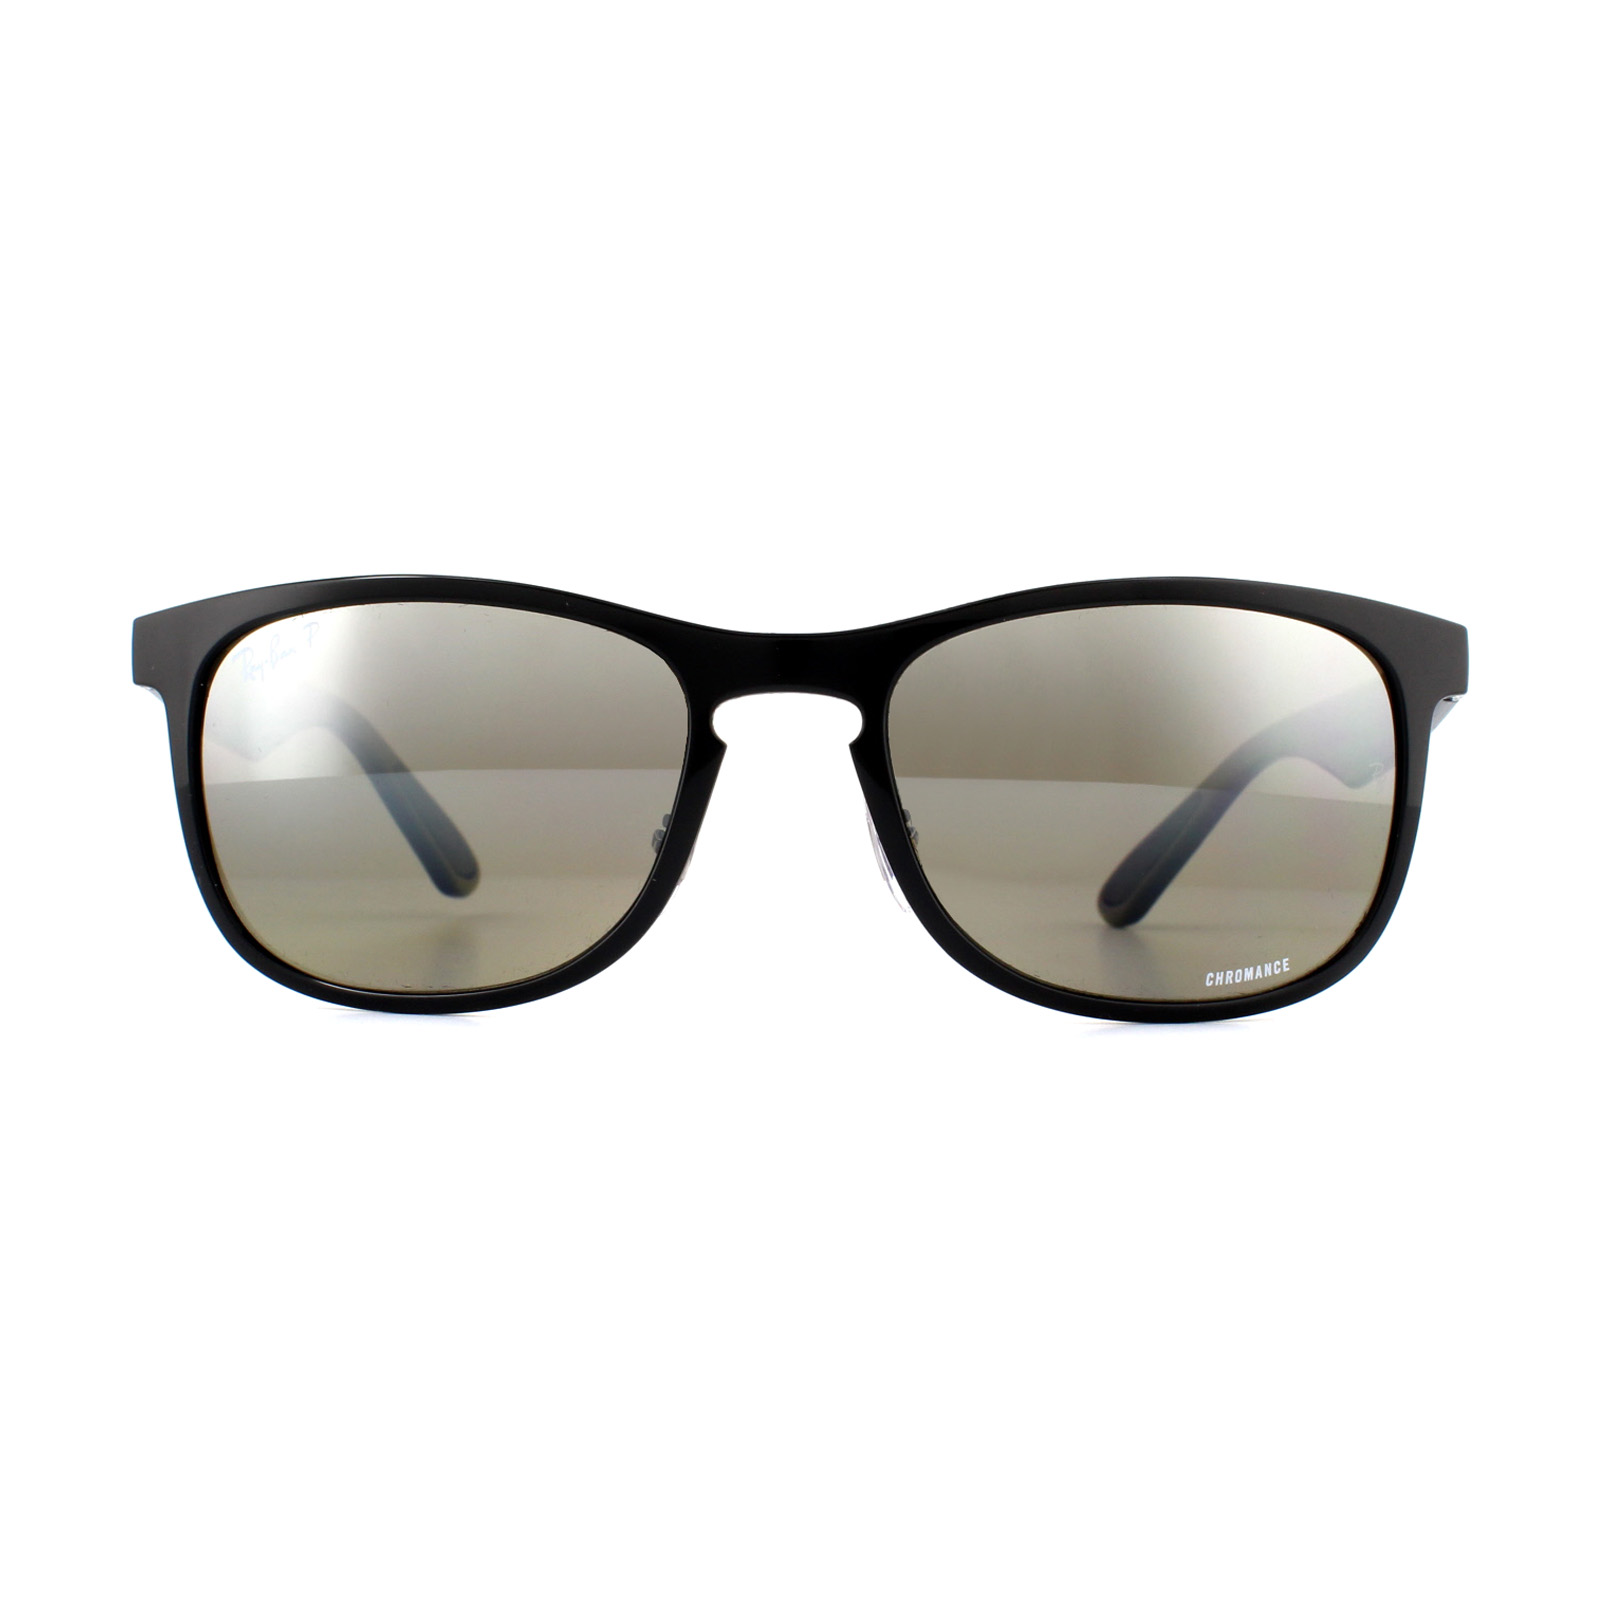 a90938921f Sentinel Ray-Ban Sunglasses RB4263 601 5J Black Grey Polarized Mirror  Silver Chromance